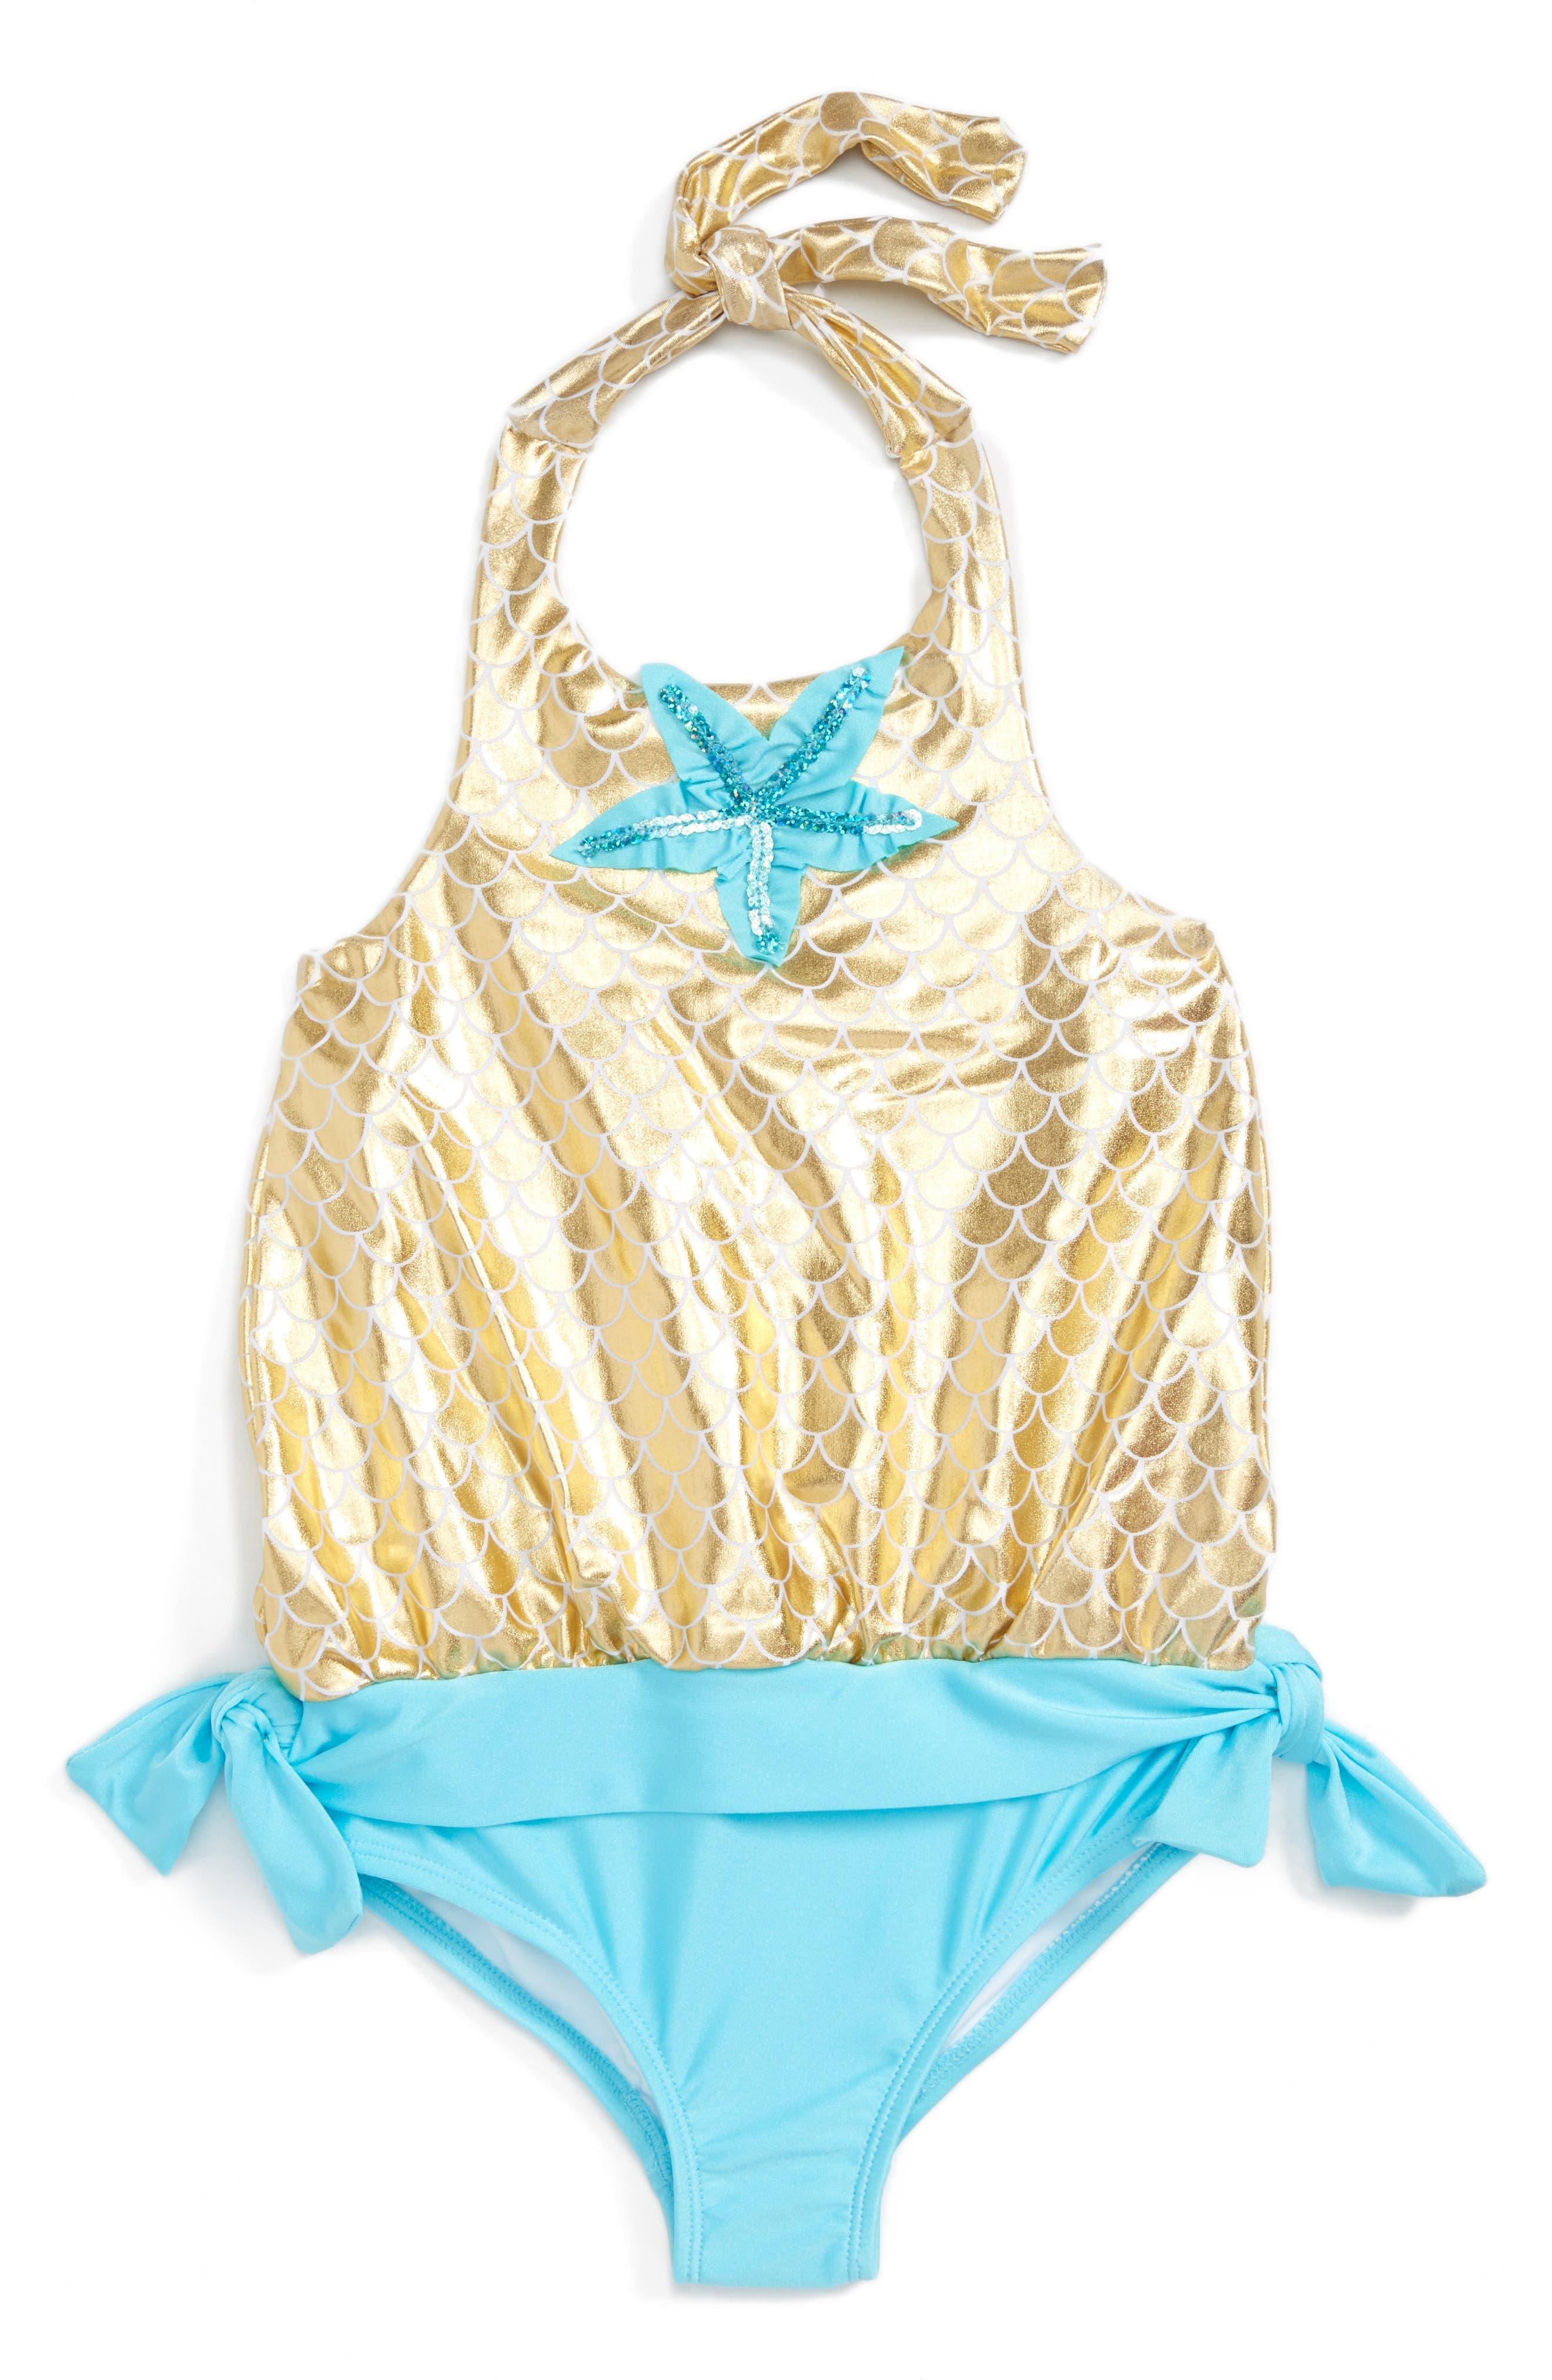 Main Image - Love U Lots Starfish One-Piece Swimsuit (Toddler Girls & Little Girls)